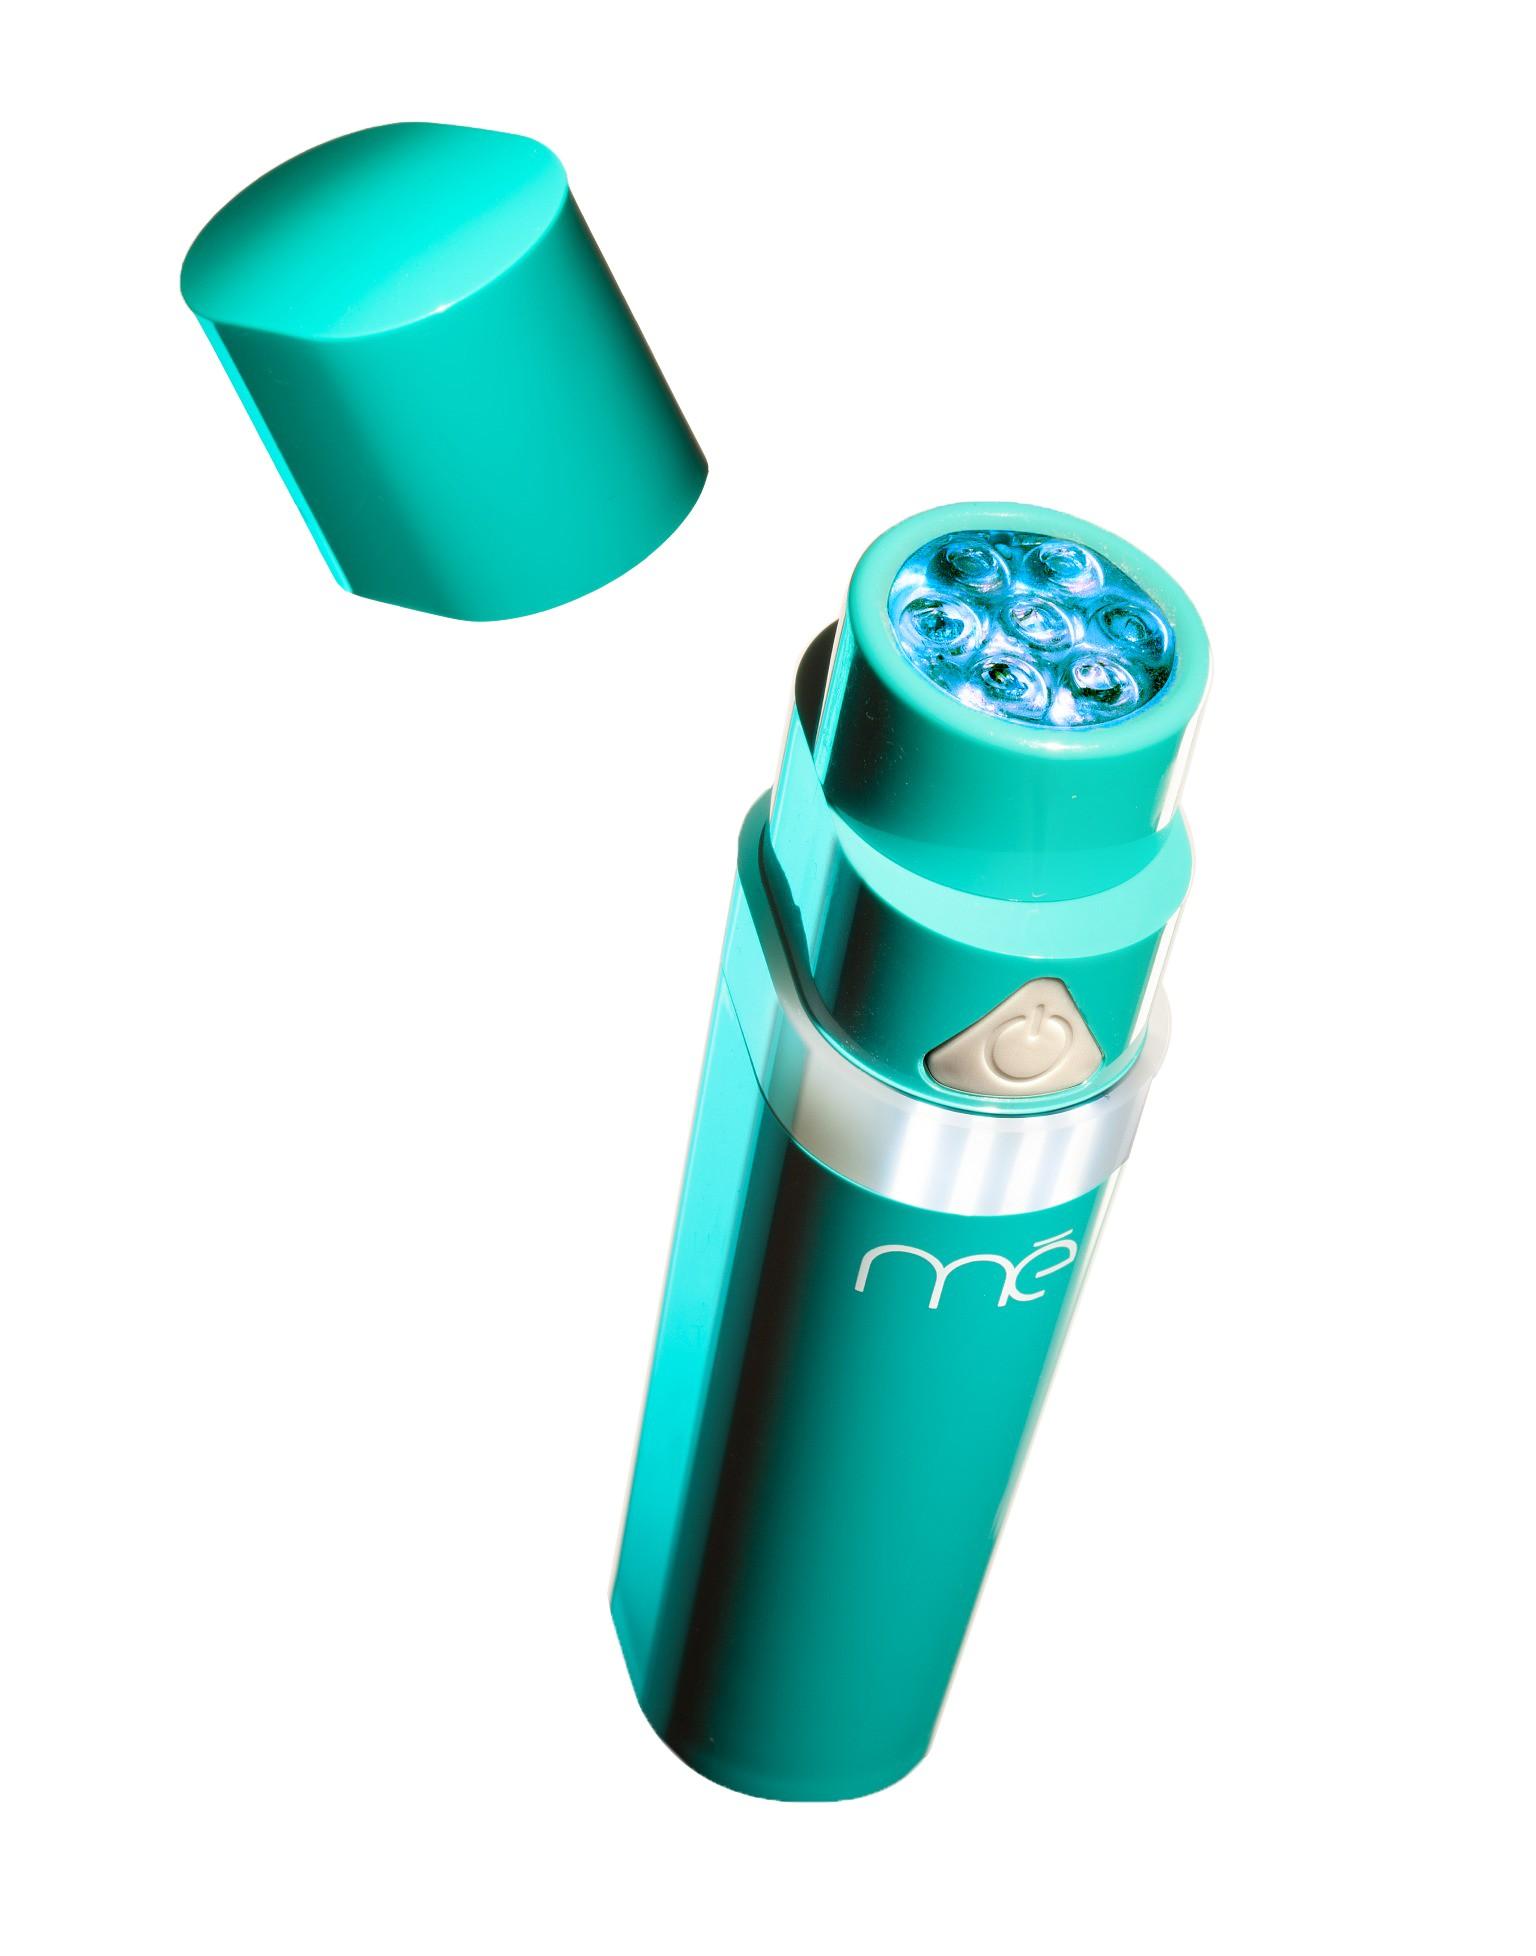 mē clear Blue Light Anti-Blemish Device